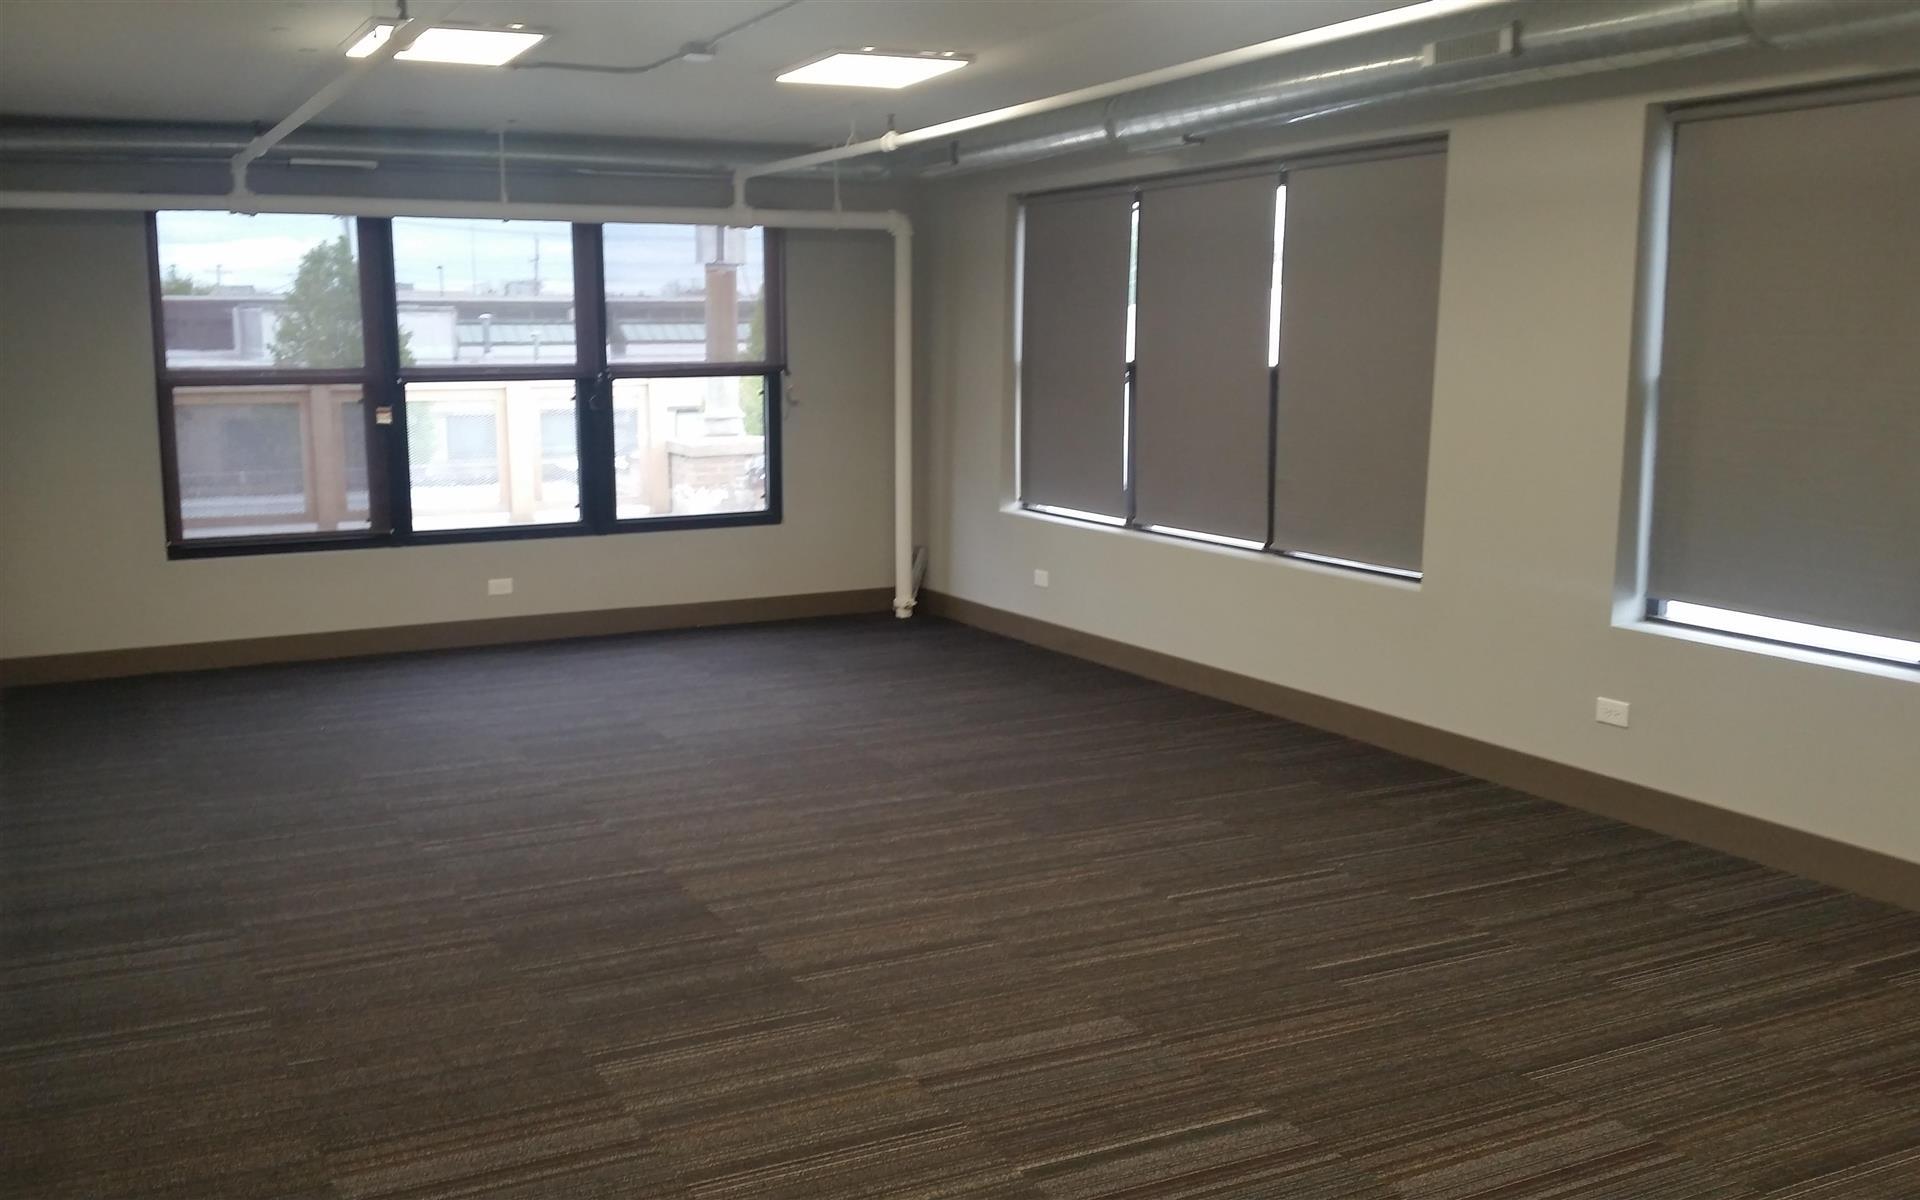 8042-8052 monticello - Office 203